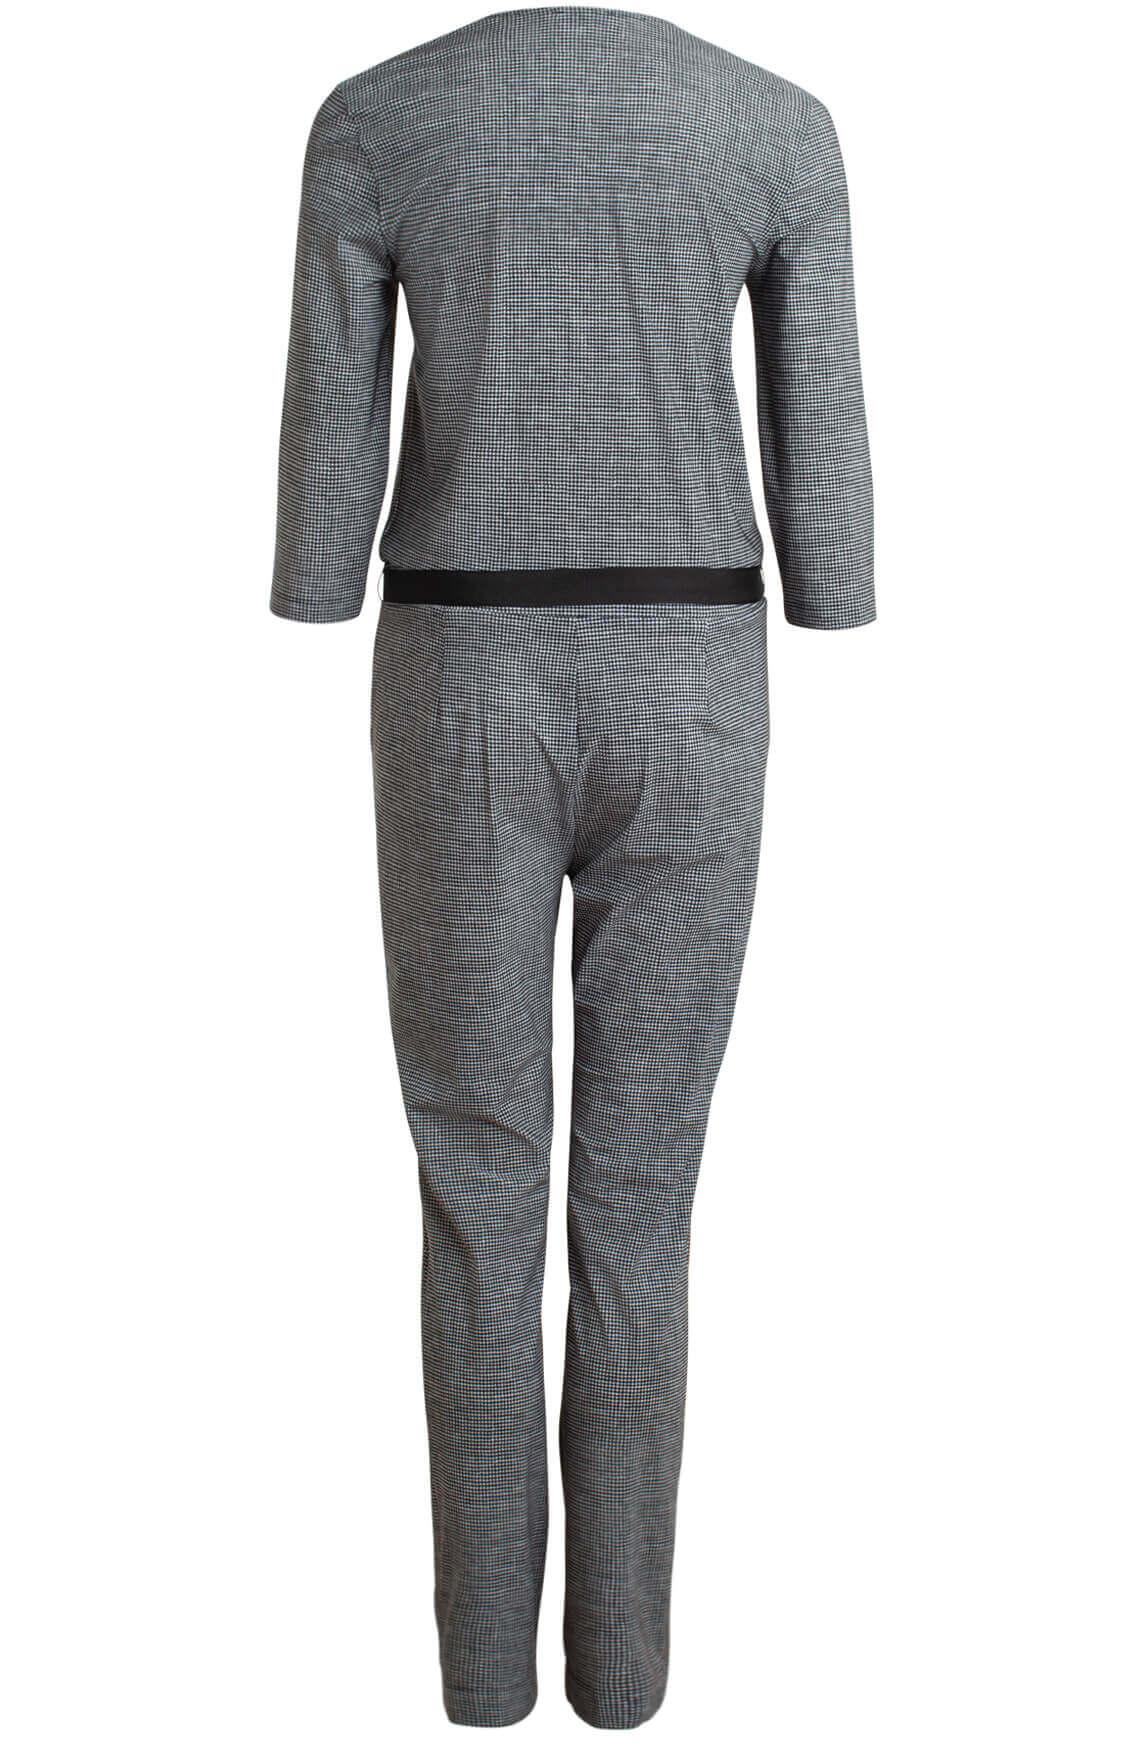 Anna Dames Pied-de-coque jumpsuit zwart